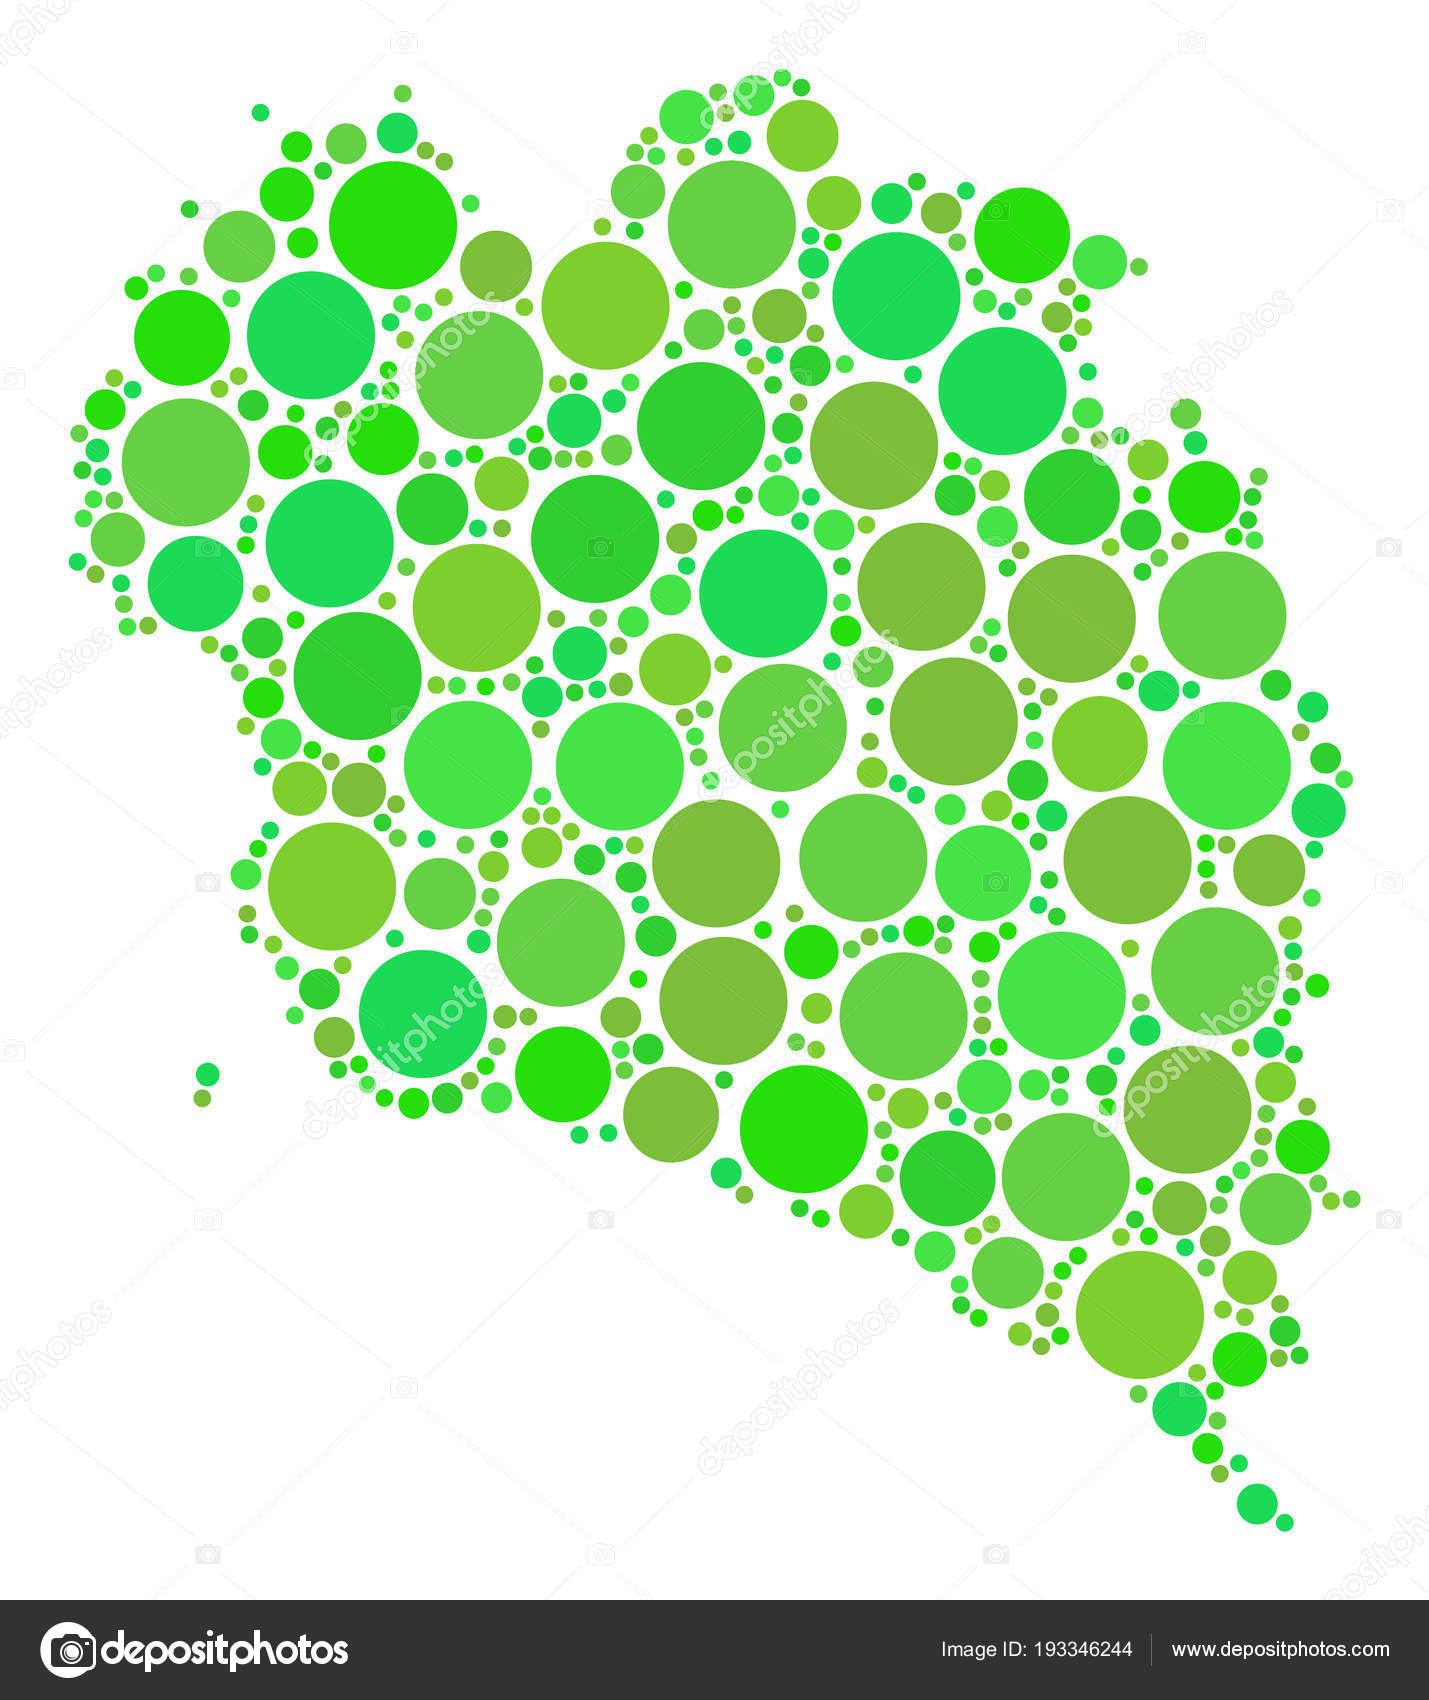 Koh Phangan Thailand Map.Koh Phangan Thai Island Map Mosaic Of Dots Stock Vector C Ahasoft